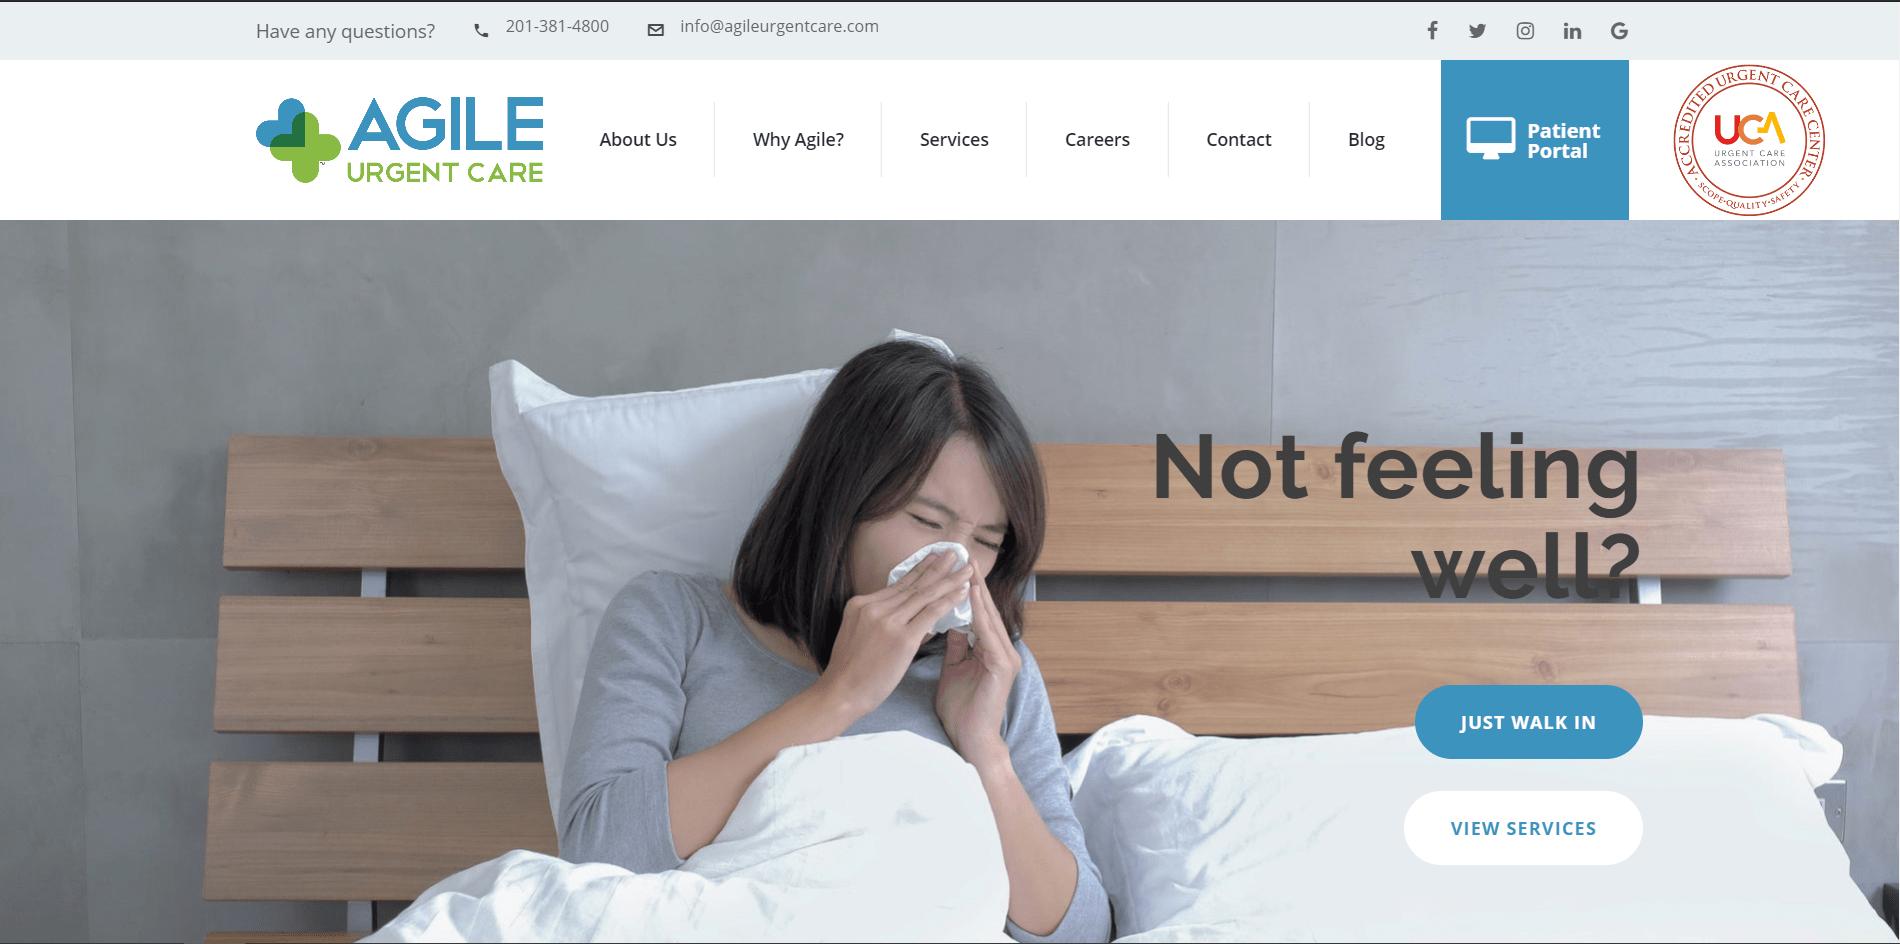 "<a href=""https://www.agileurgentcare.com/"">www.agileurgentcare.com</a>"